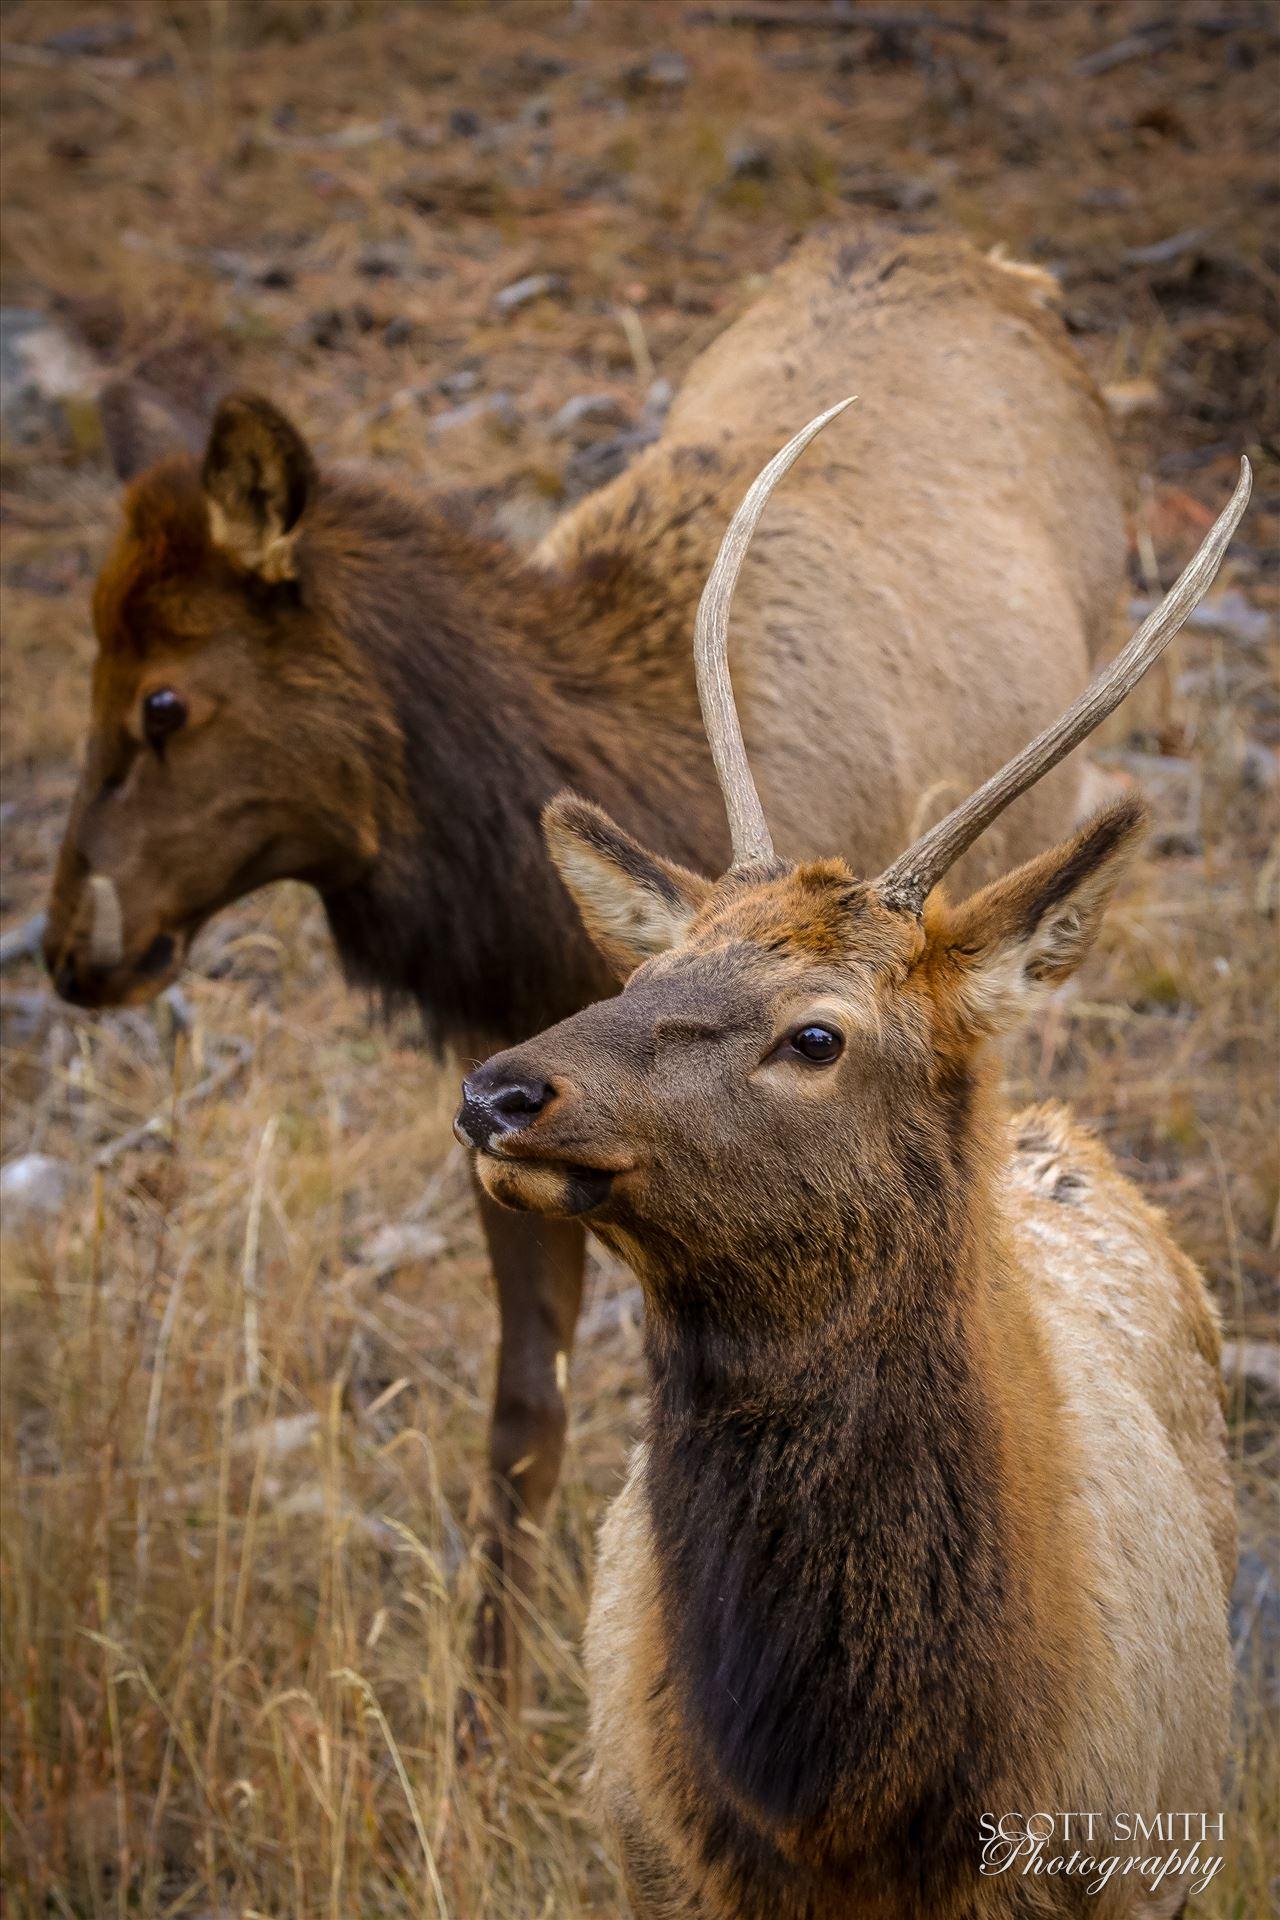 Sunday Elk No 09 - A heard of Elk near the entrance to Rocky Mountain National Park, Estes Park, Colorado. by D Scott Smith